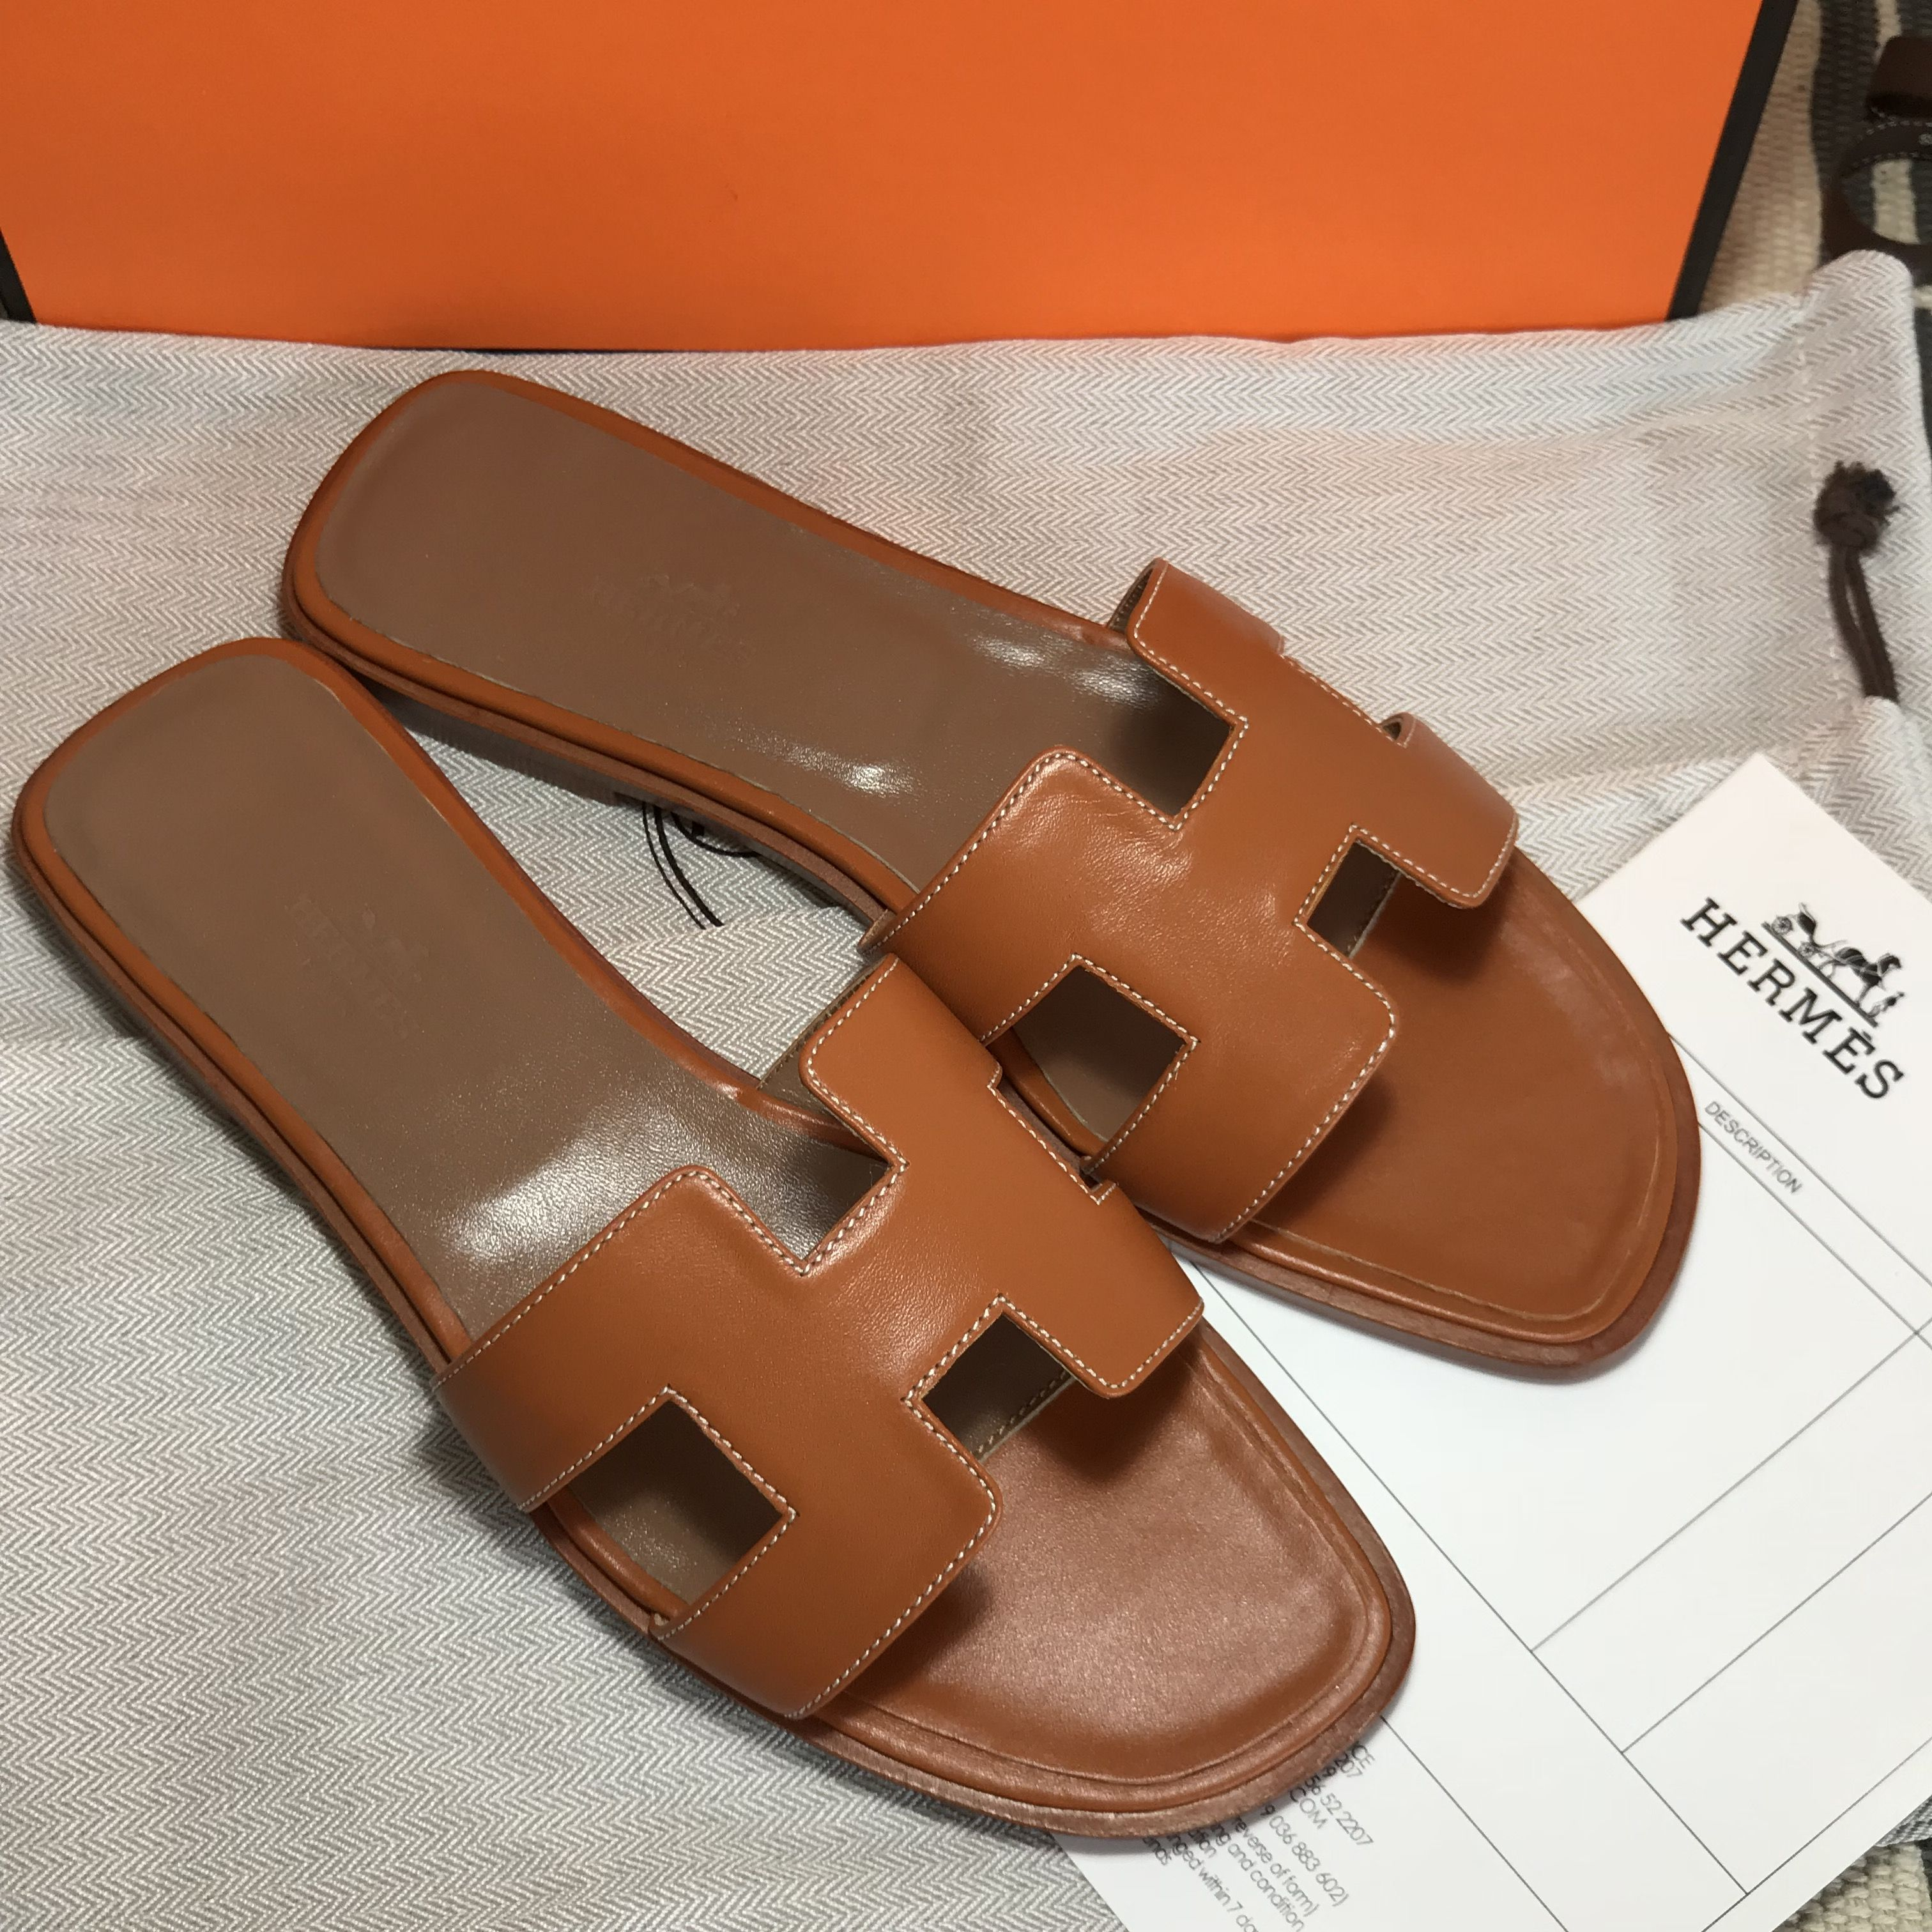 Slippers ShoesIn Leather Slides Hermes BrownFab 2019 PkXZiOu